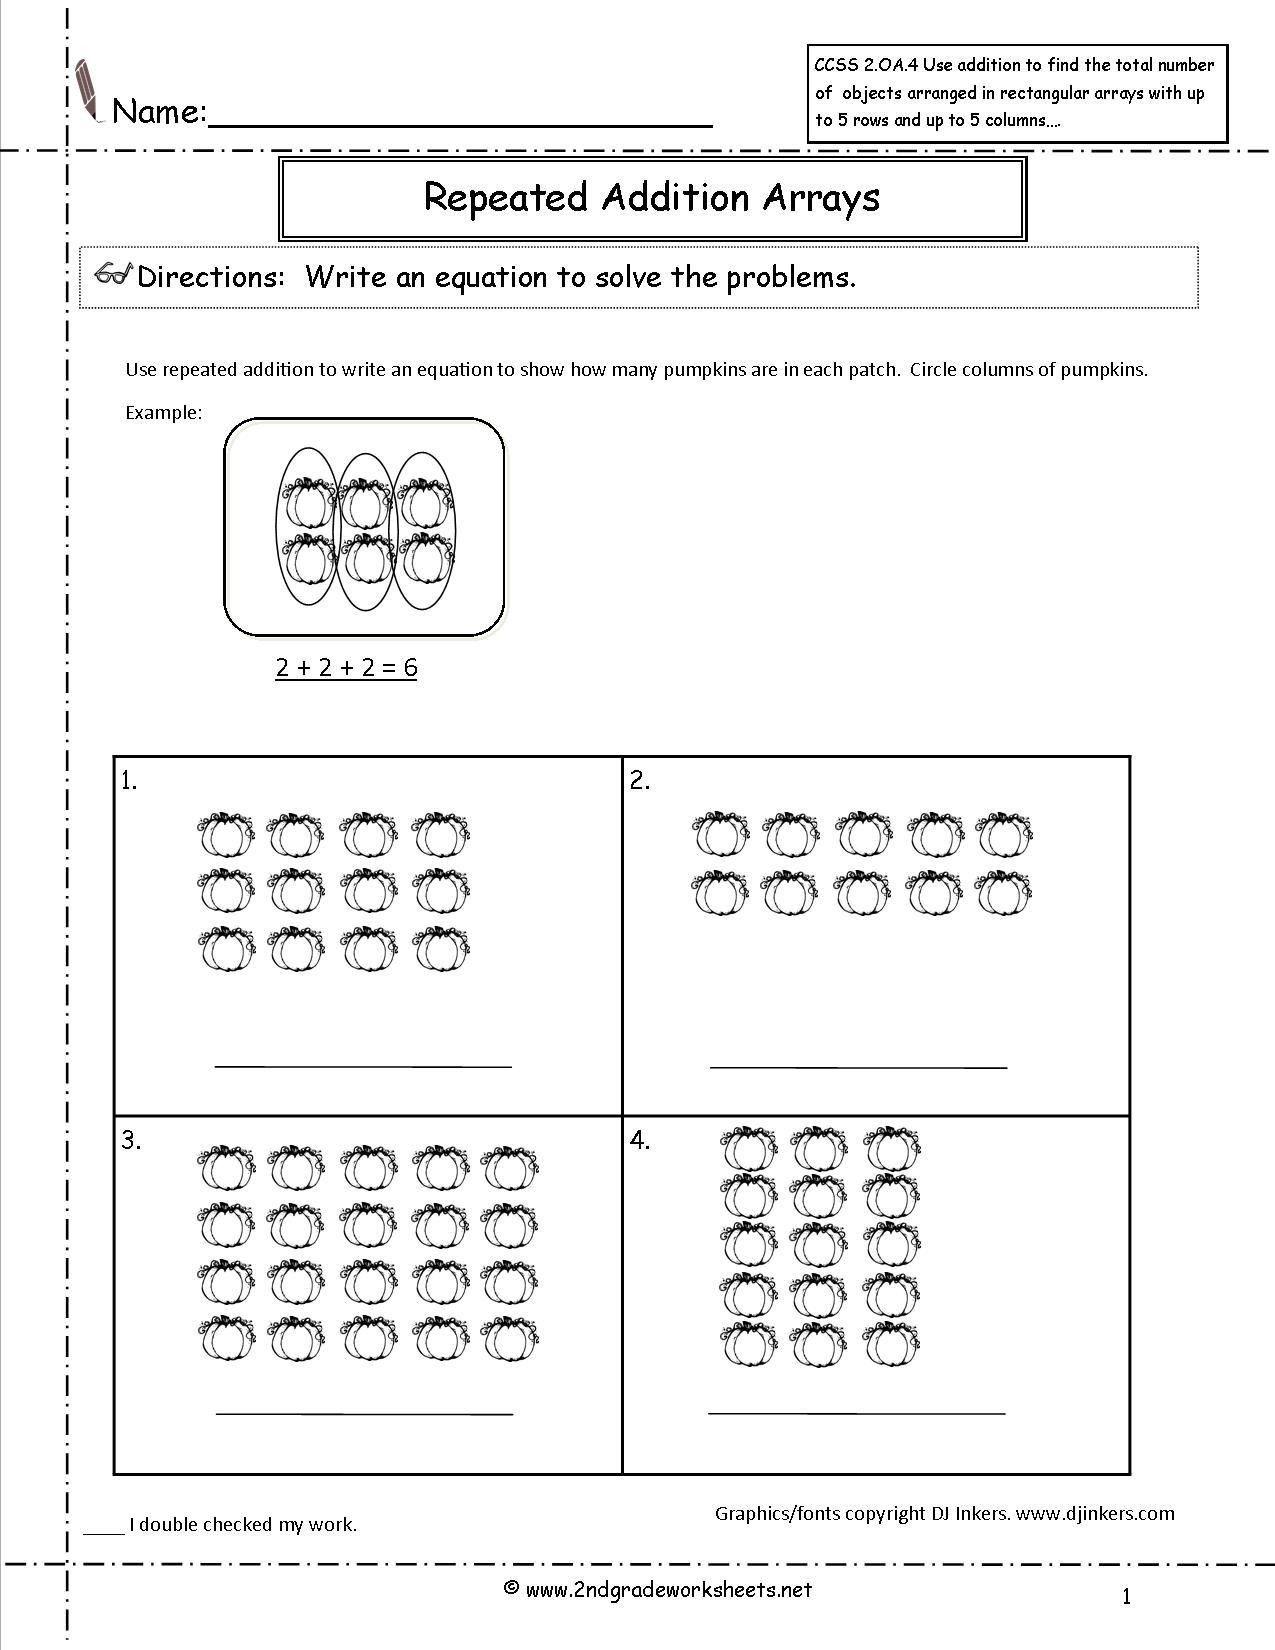 Division with Arrays Worksheet Pumpkins Repeated Addition Worksheet in 2020    Repeated addition worksheets [ 1650 x 1275 Pixel ]